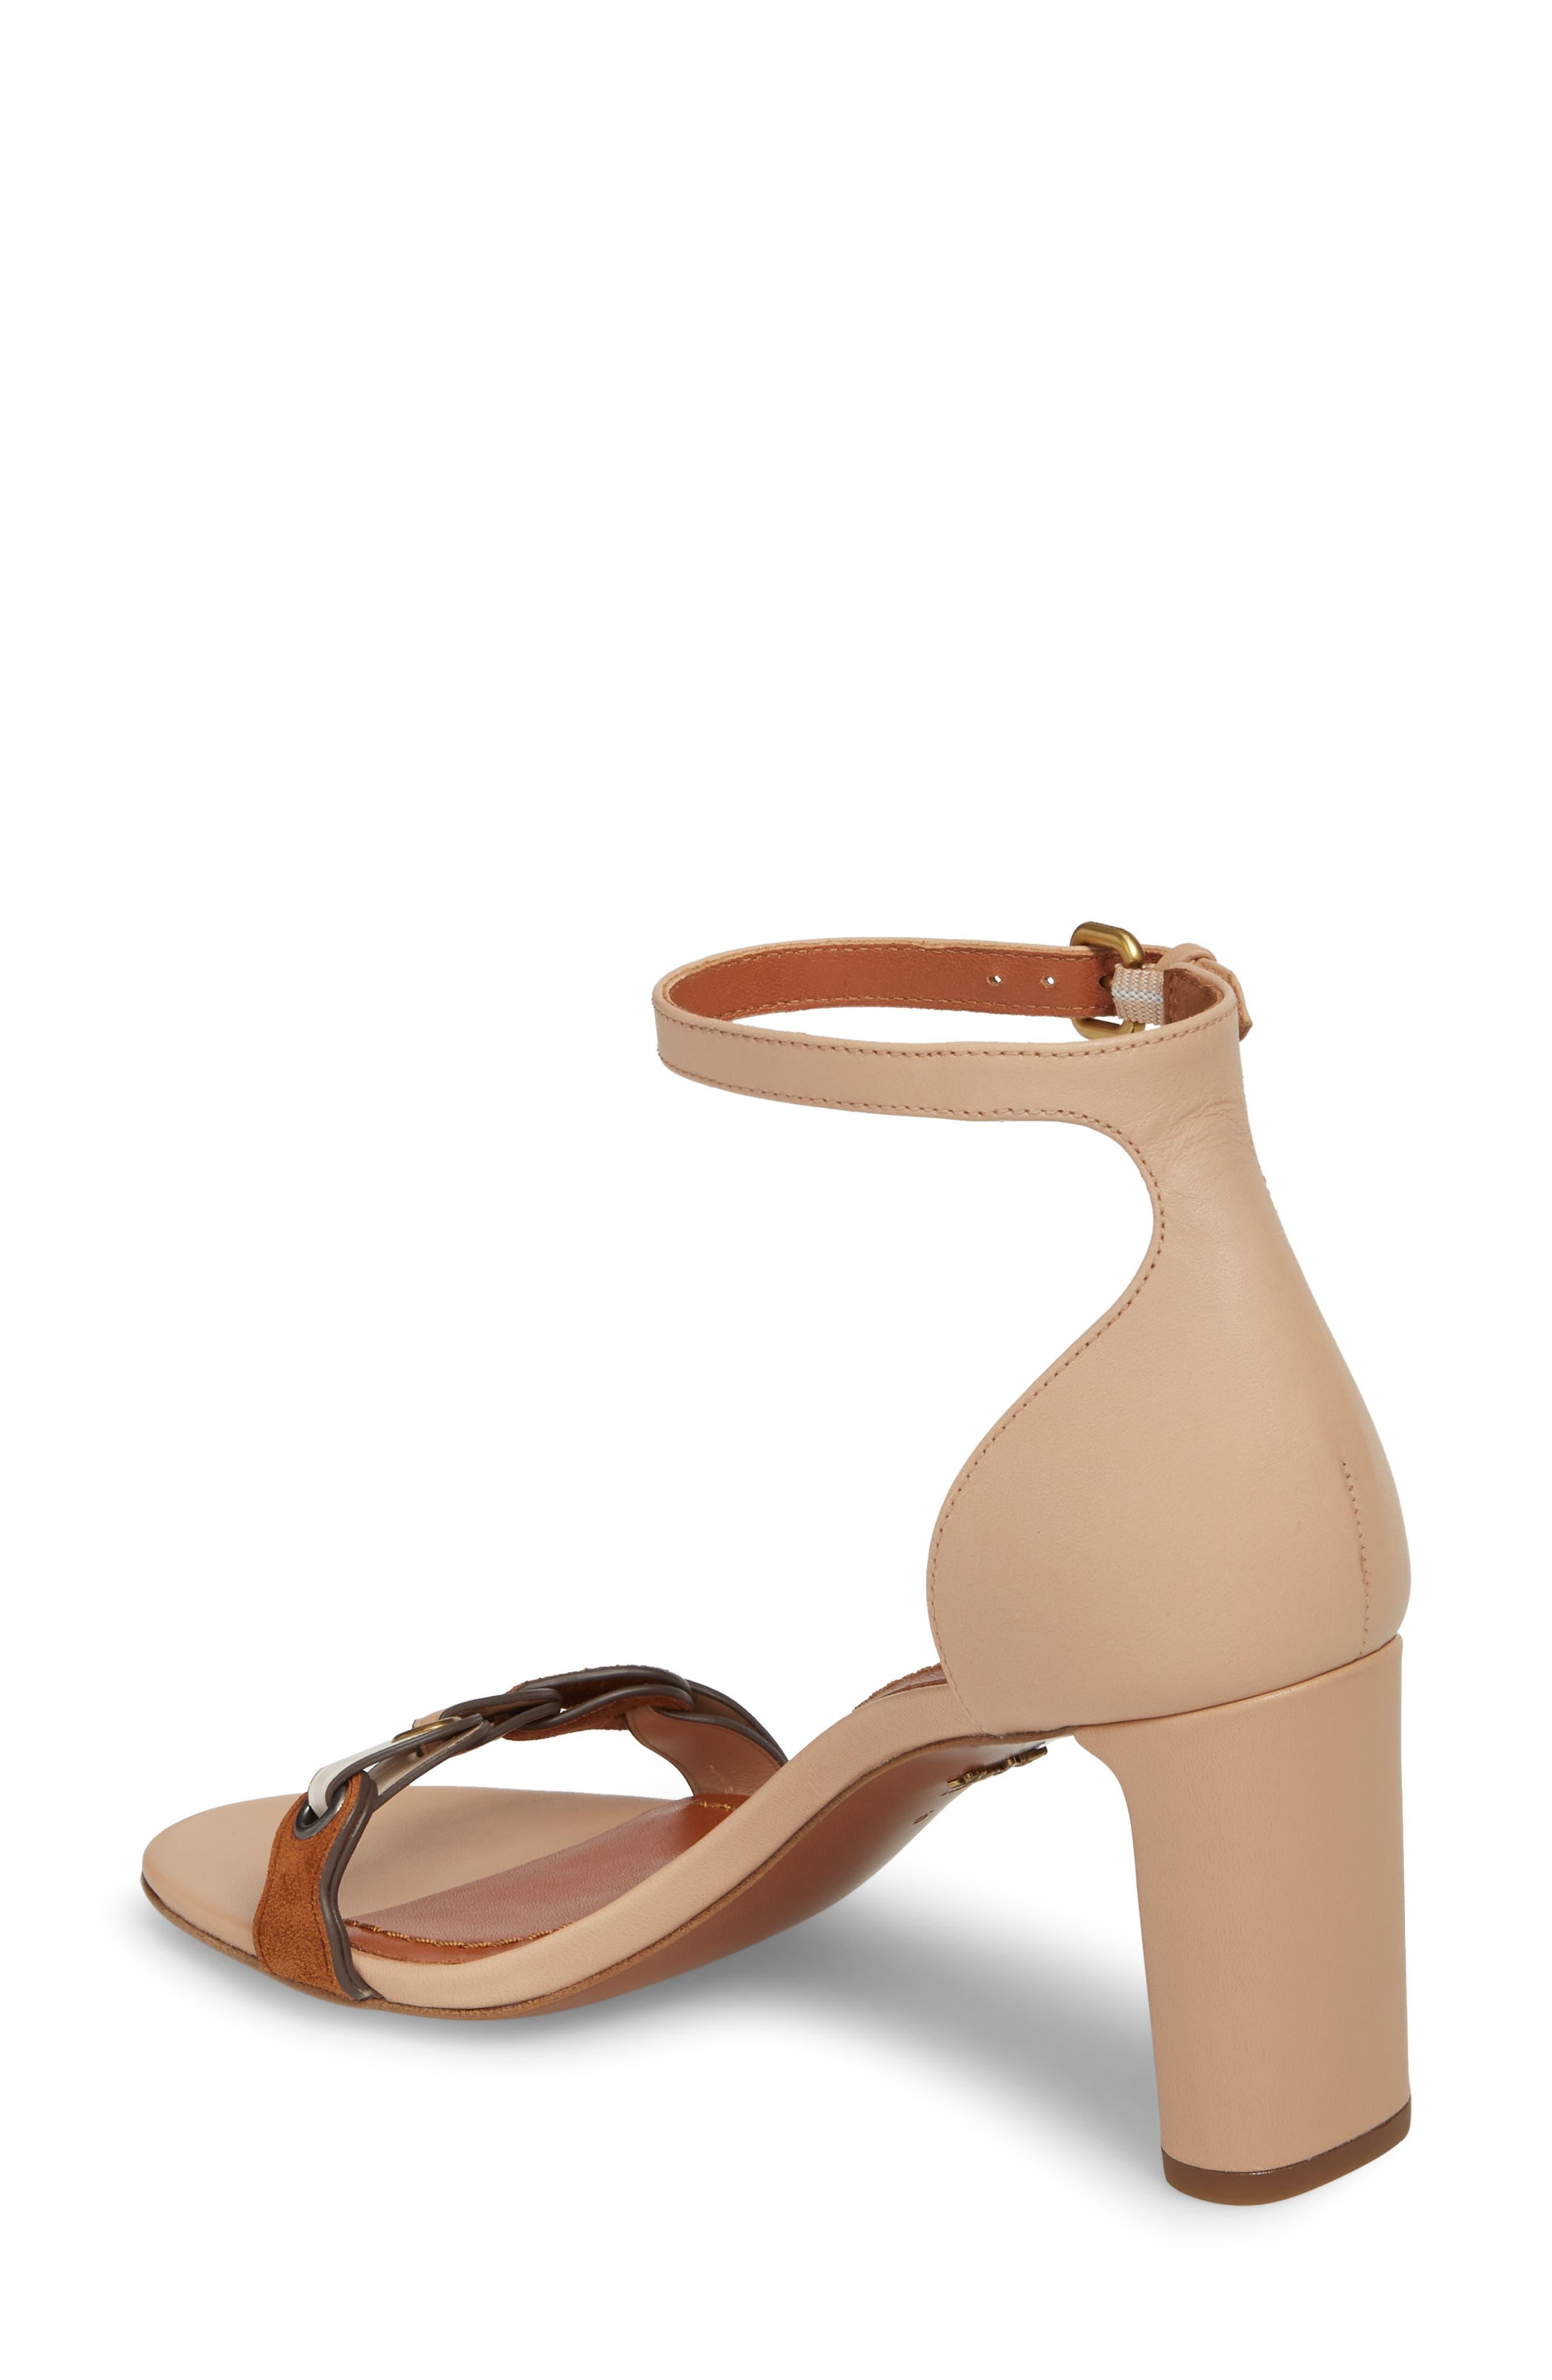 Link Ankle Strap Sandal,                             Alternate thumbnail 4, color,